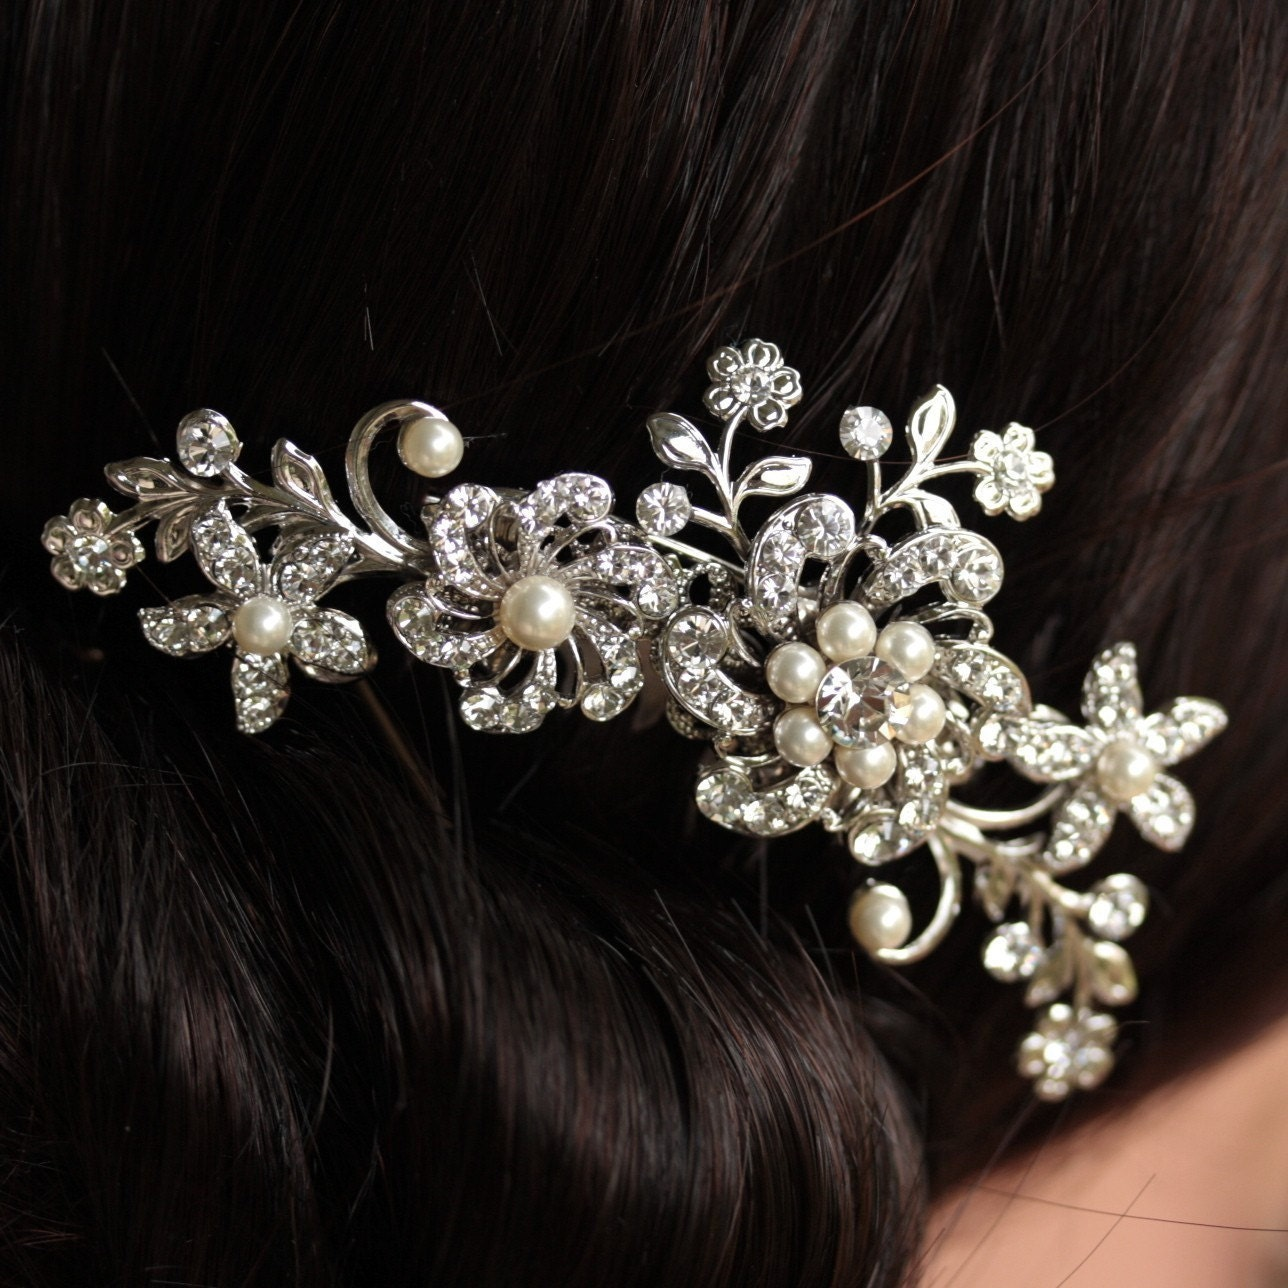 Bridal Hair Comb, Swarovski, Rhinestone, Ivory Pearl, Vintage Floral Glamor, SABINE